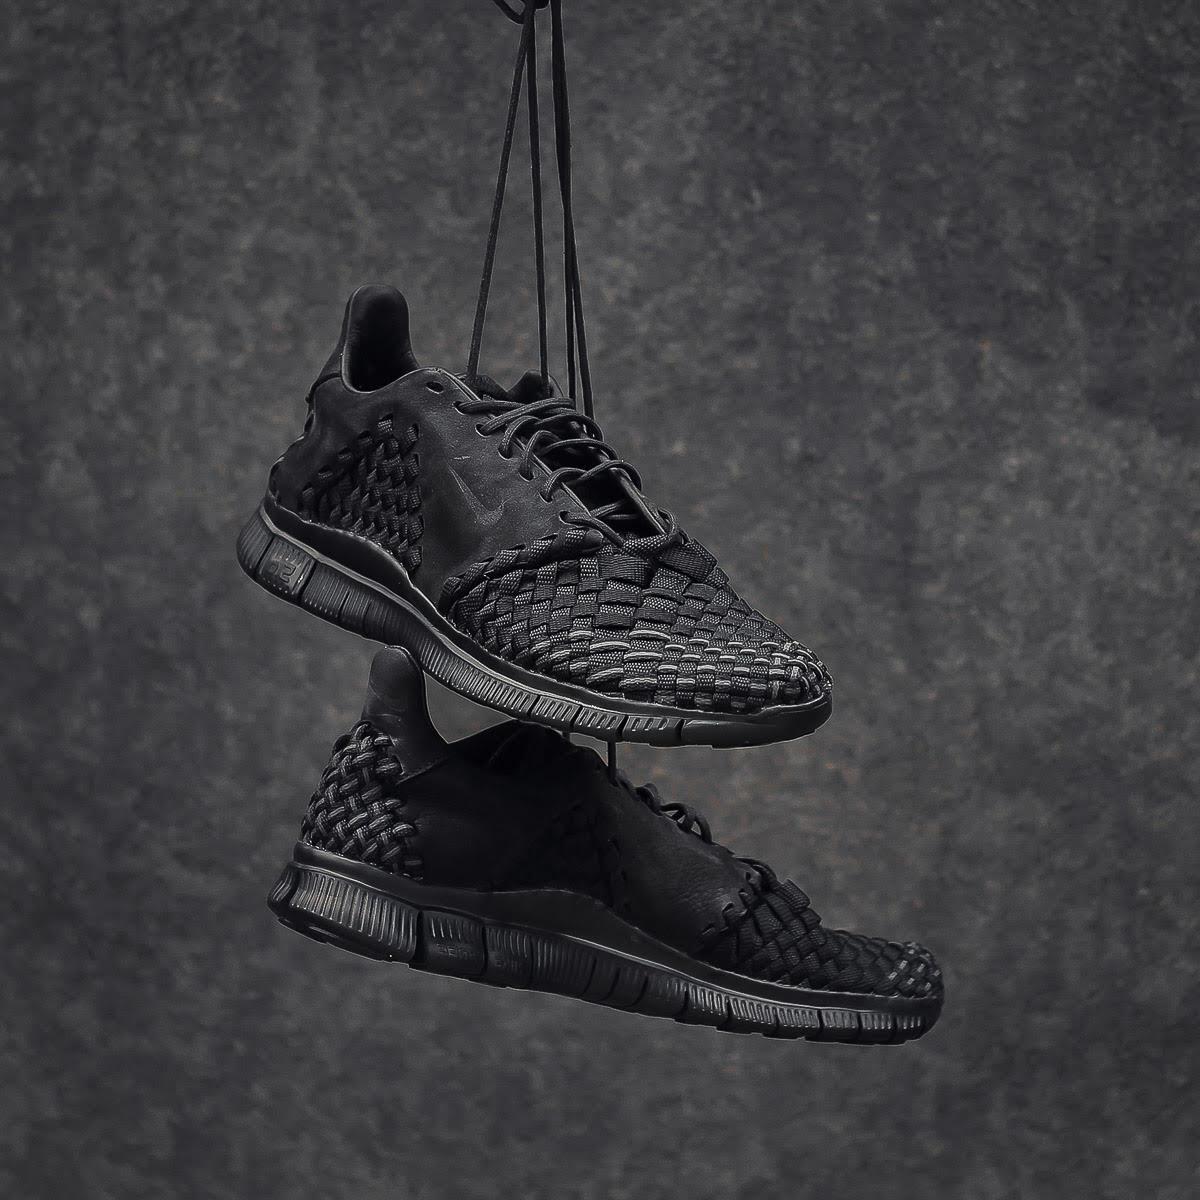 Nike Free Inneva Woven 2 Blackout On-Foot Hanging 845014-001